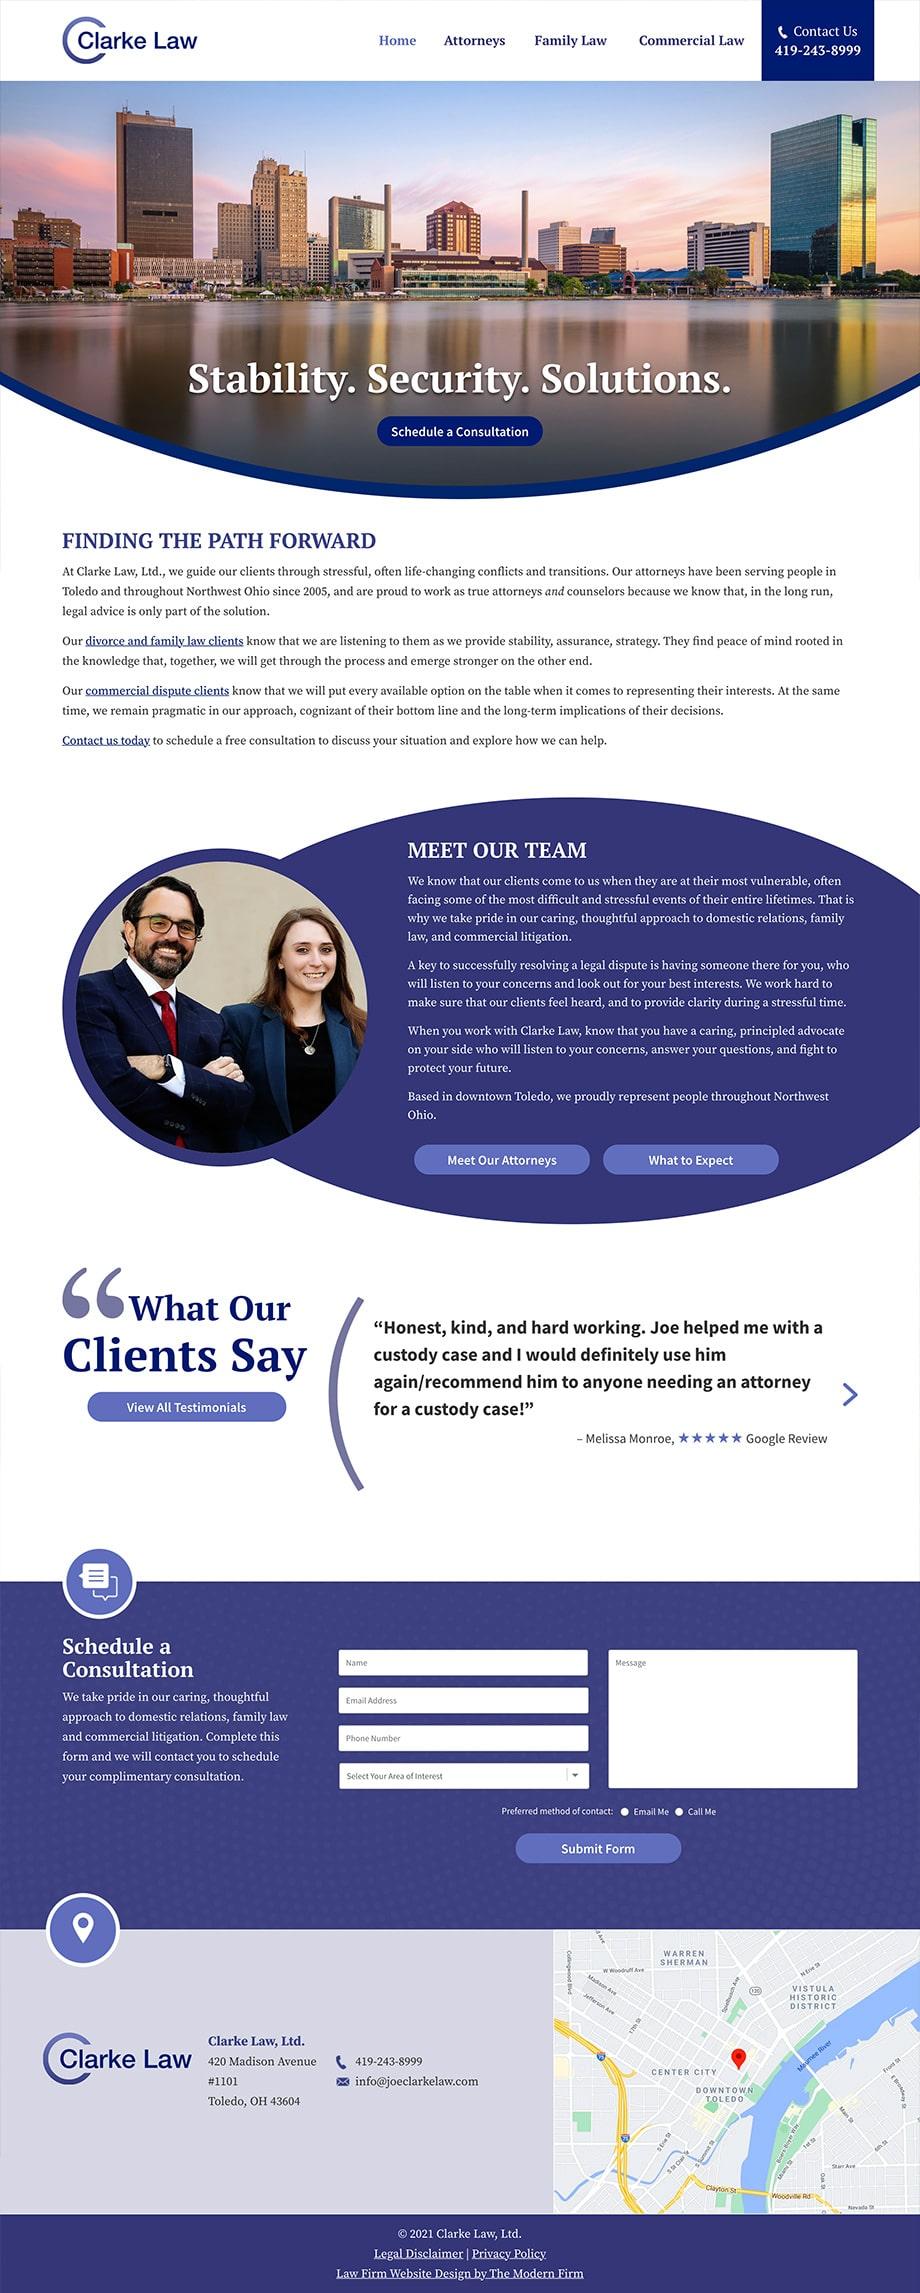 Law Firm Website Design for Clarke Law, Ltd.